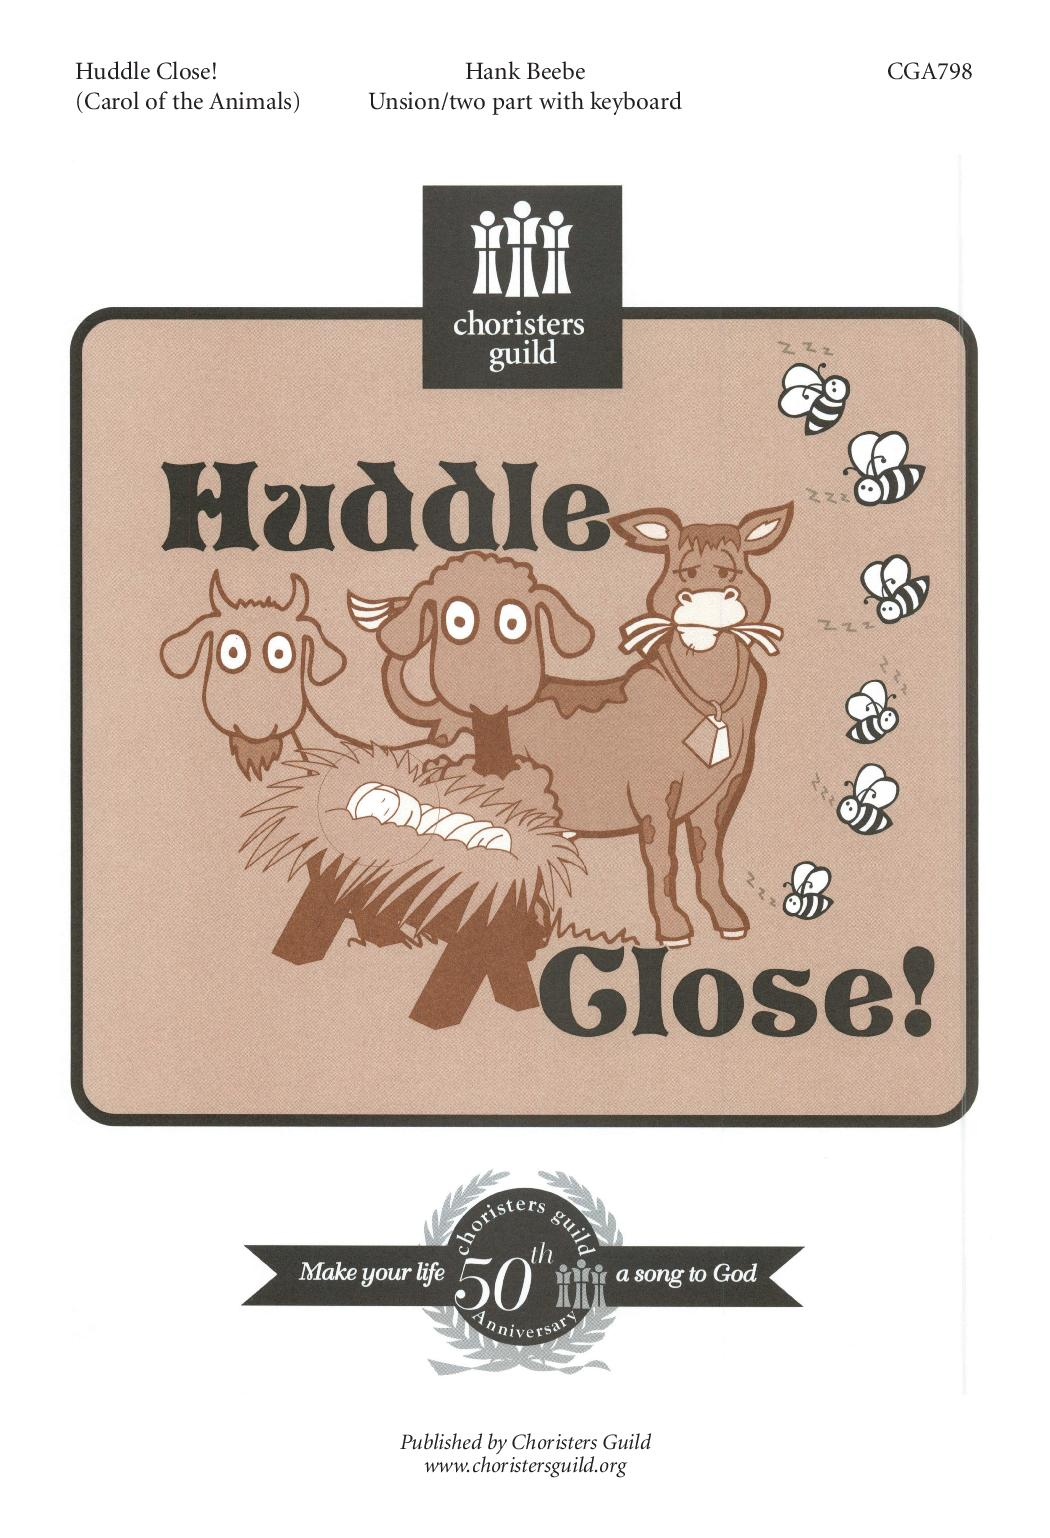 Huddle Close